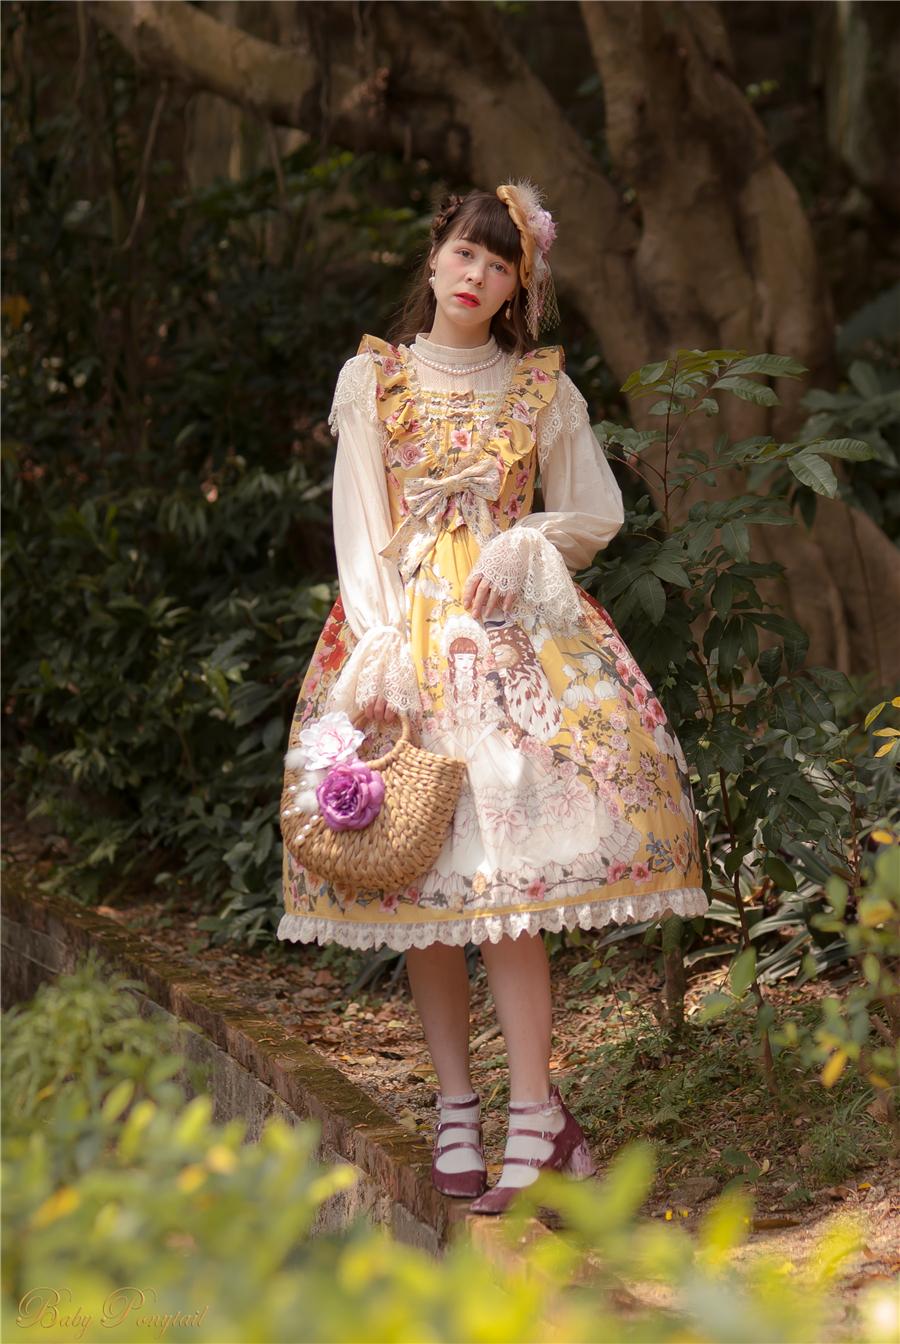 Baby Ponytail_Model Photo_Polly's Garden of Dreams_JSK Yellow_Claudia_7.jpg